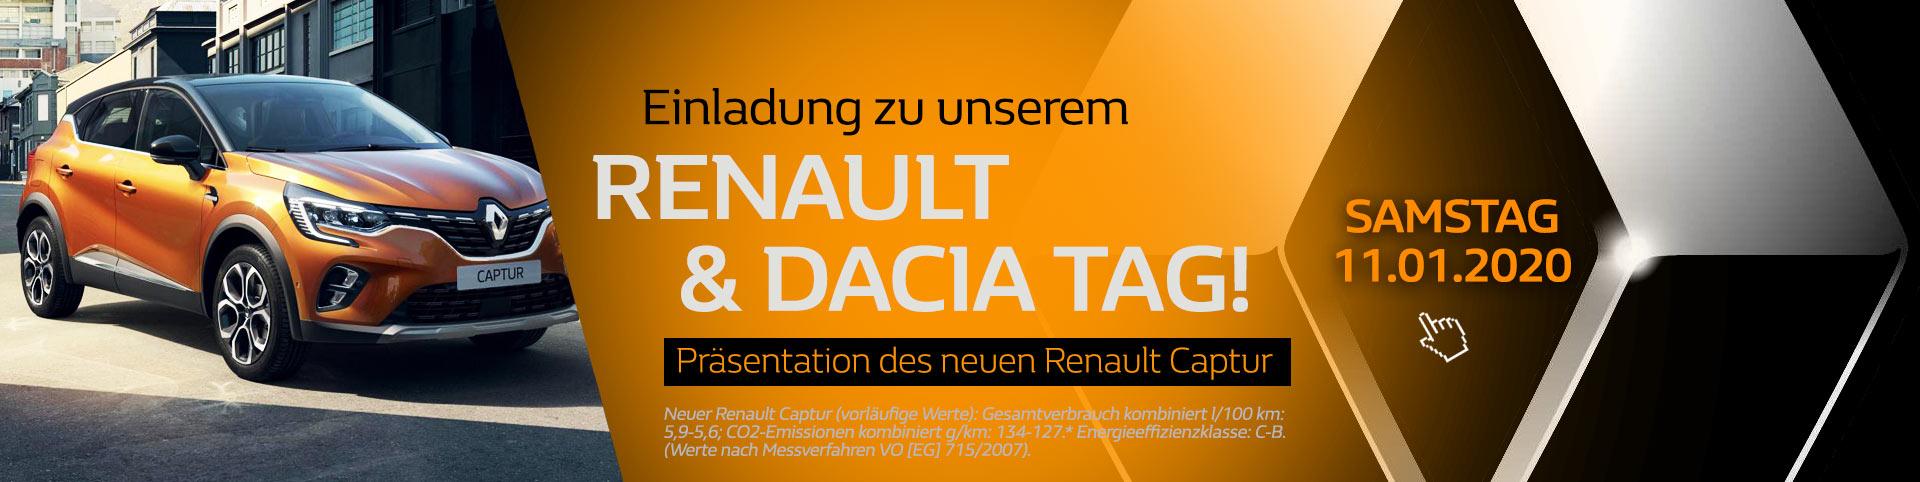 Renault Tag mit dem neuen Renault Captur 2020